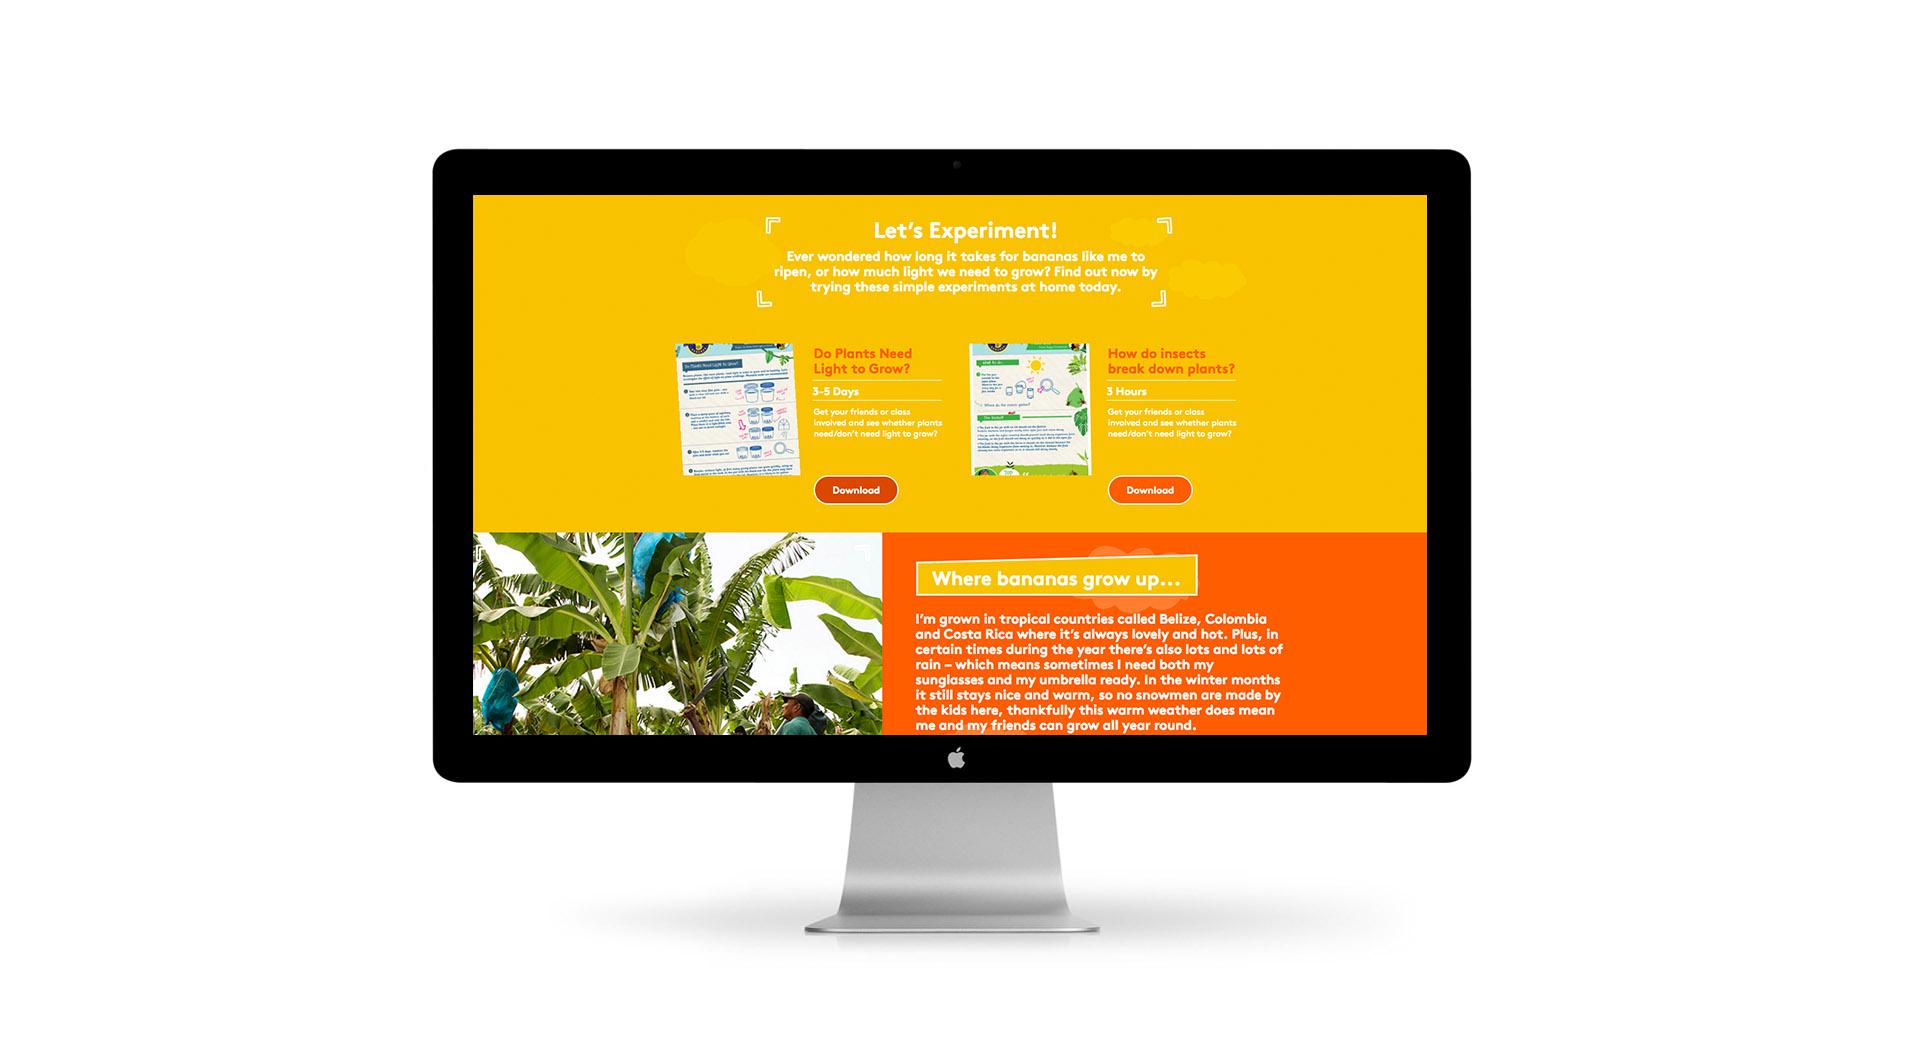 Freddy Fyffes Website Design Freddy Fyffes Website Lets Experiment Website Design.